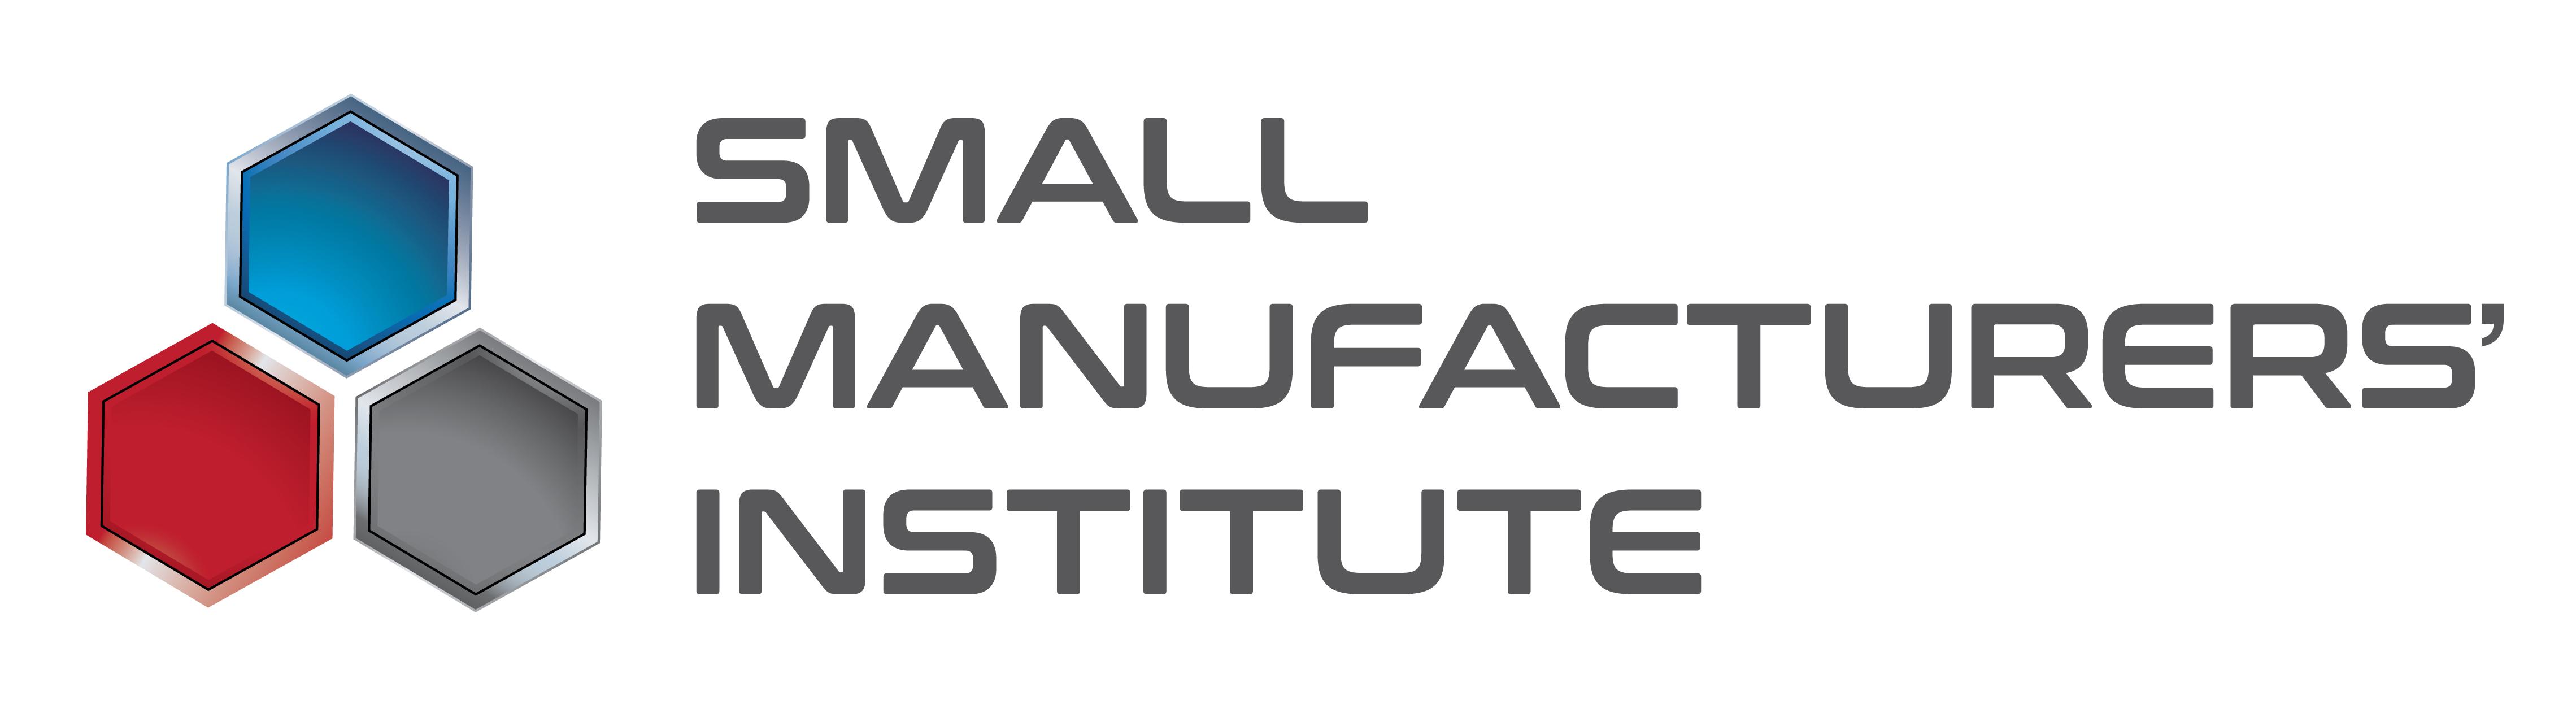 Small Manufacturers Institute